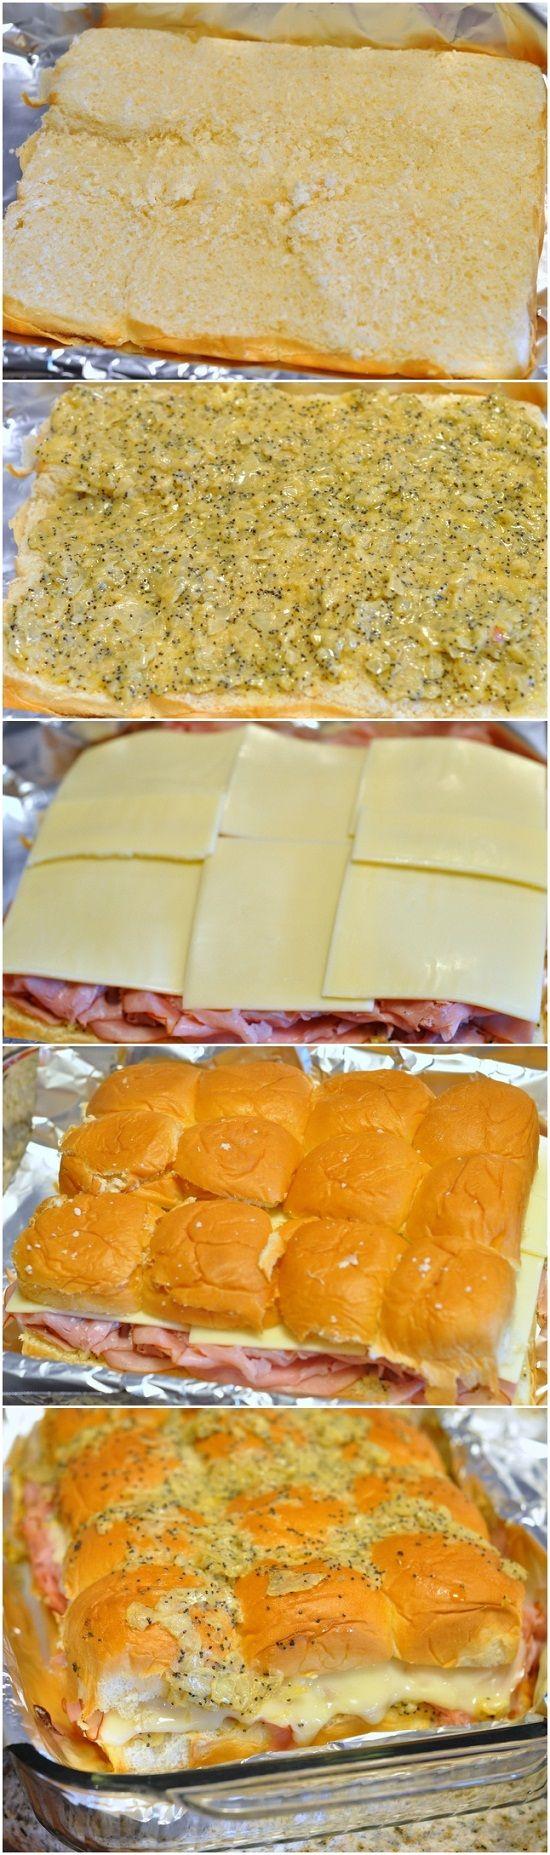 Mini poppy seed ham sandwiches on hawaiian sweet rolls